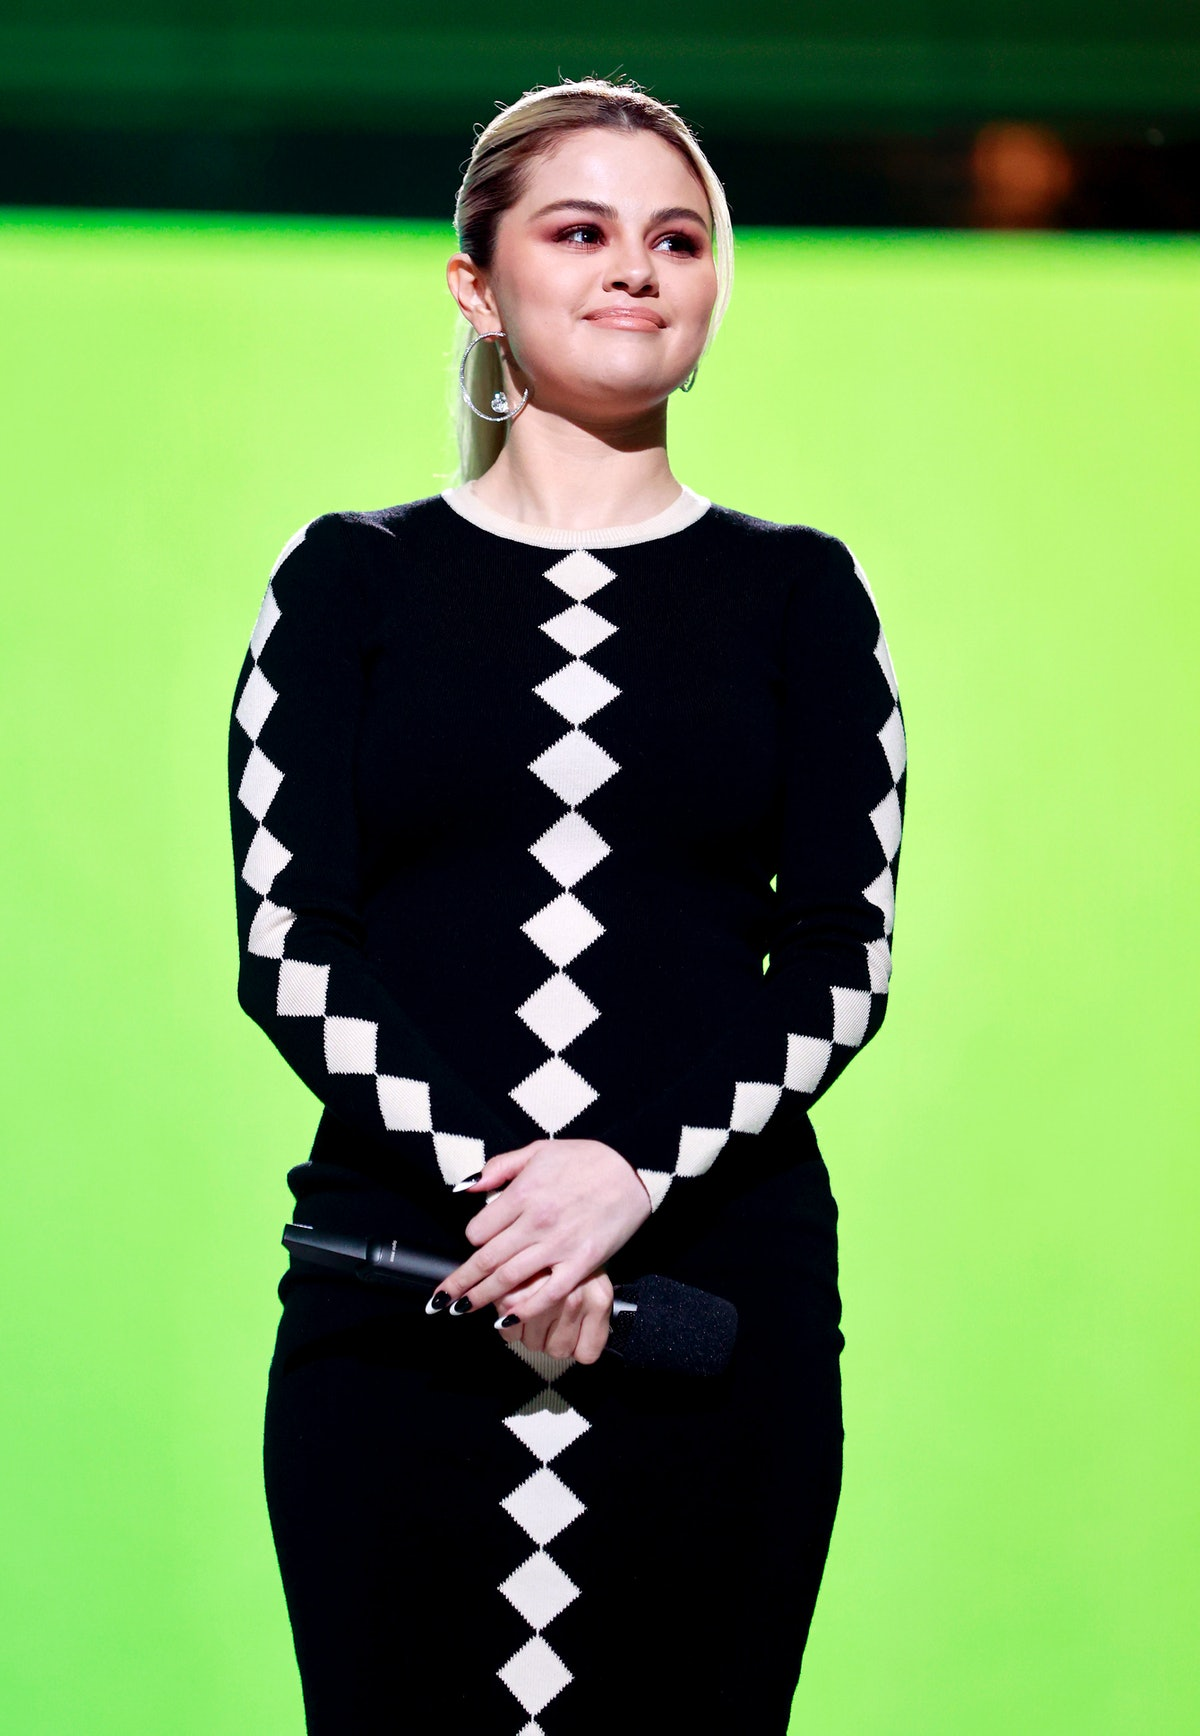 INGLEWOOD, CALIFORNIA: In this image released on May 2, Selena Gomez speaks onstage during Global Ci...